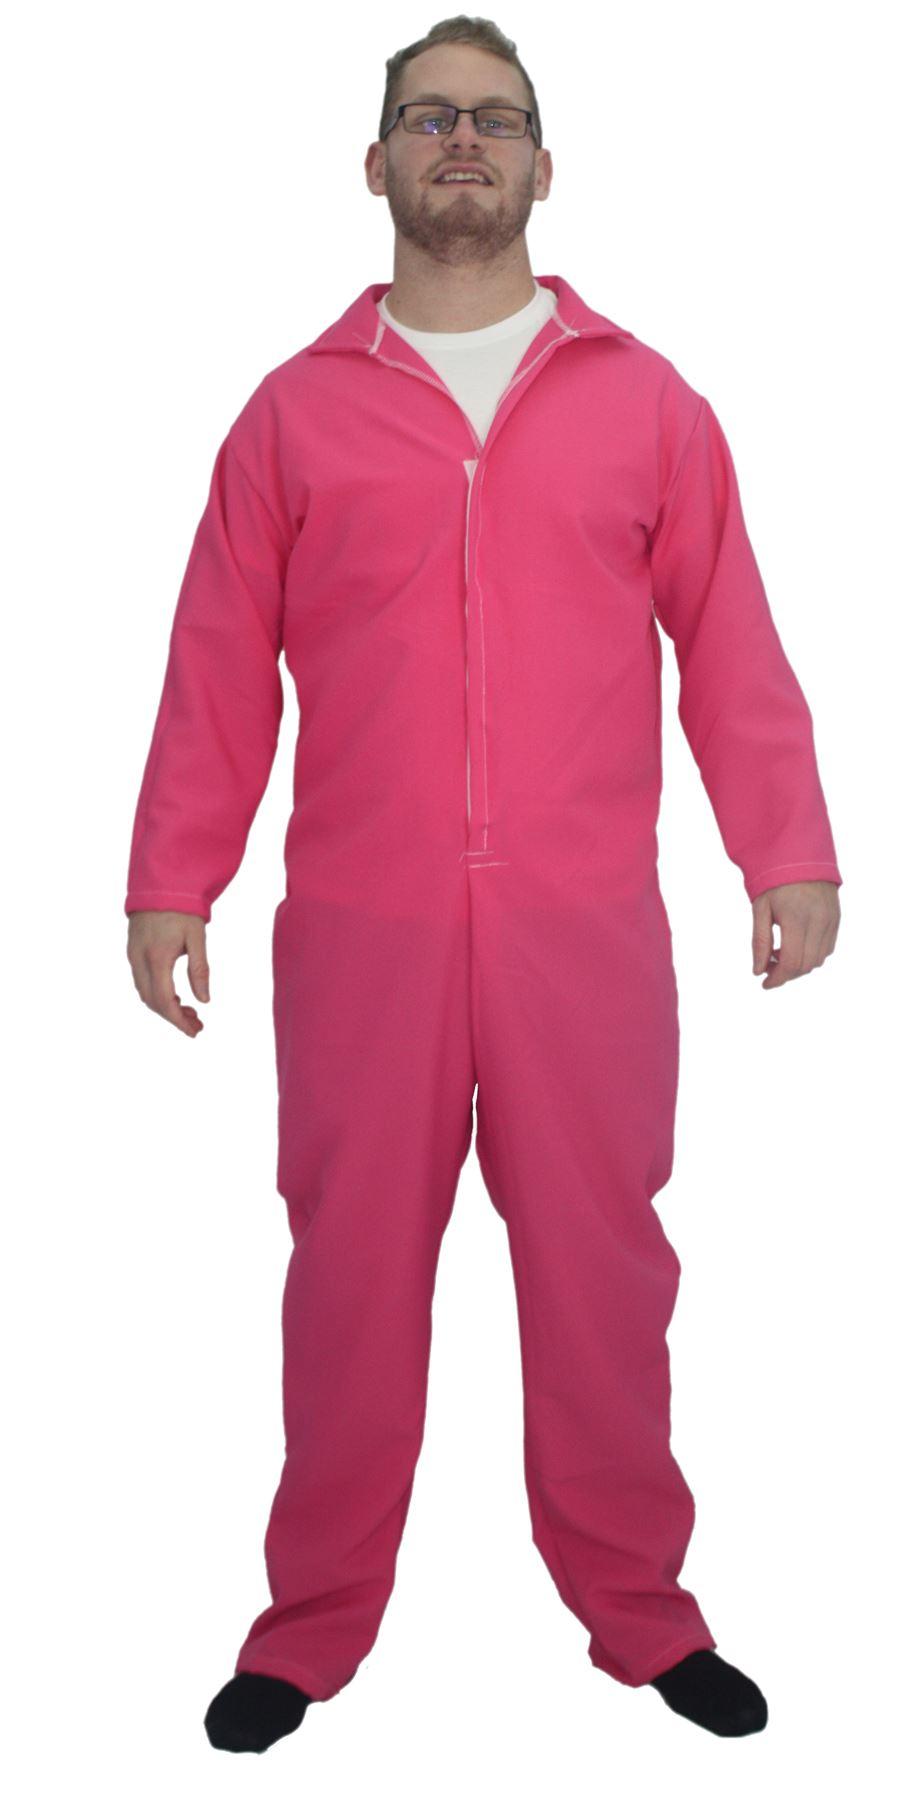 ce4b9adcf4 Adults Pink Plain Overalls Mechanic Boilersuit Fancy Dress